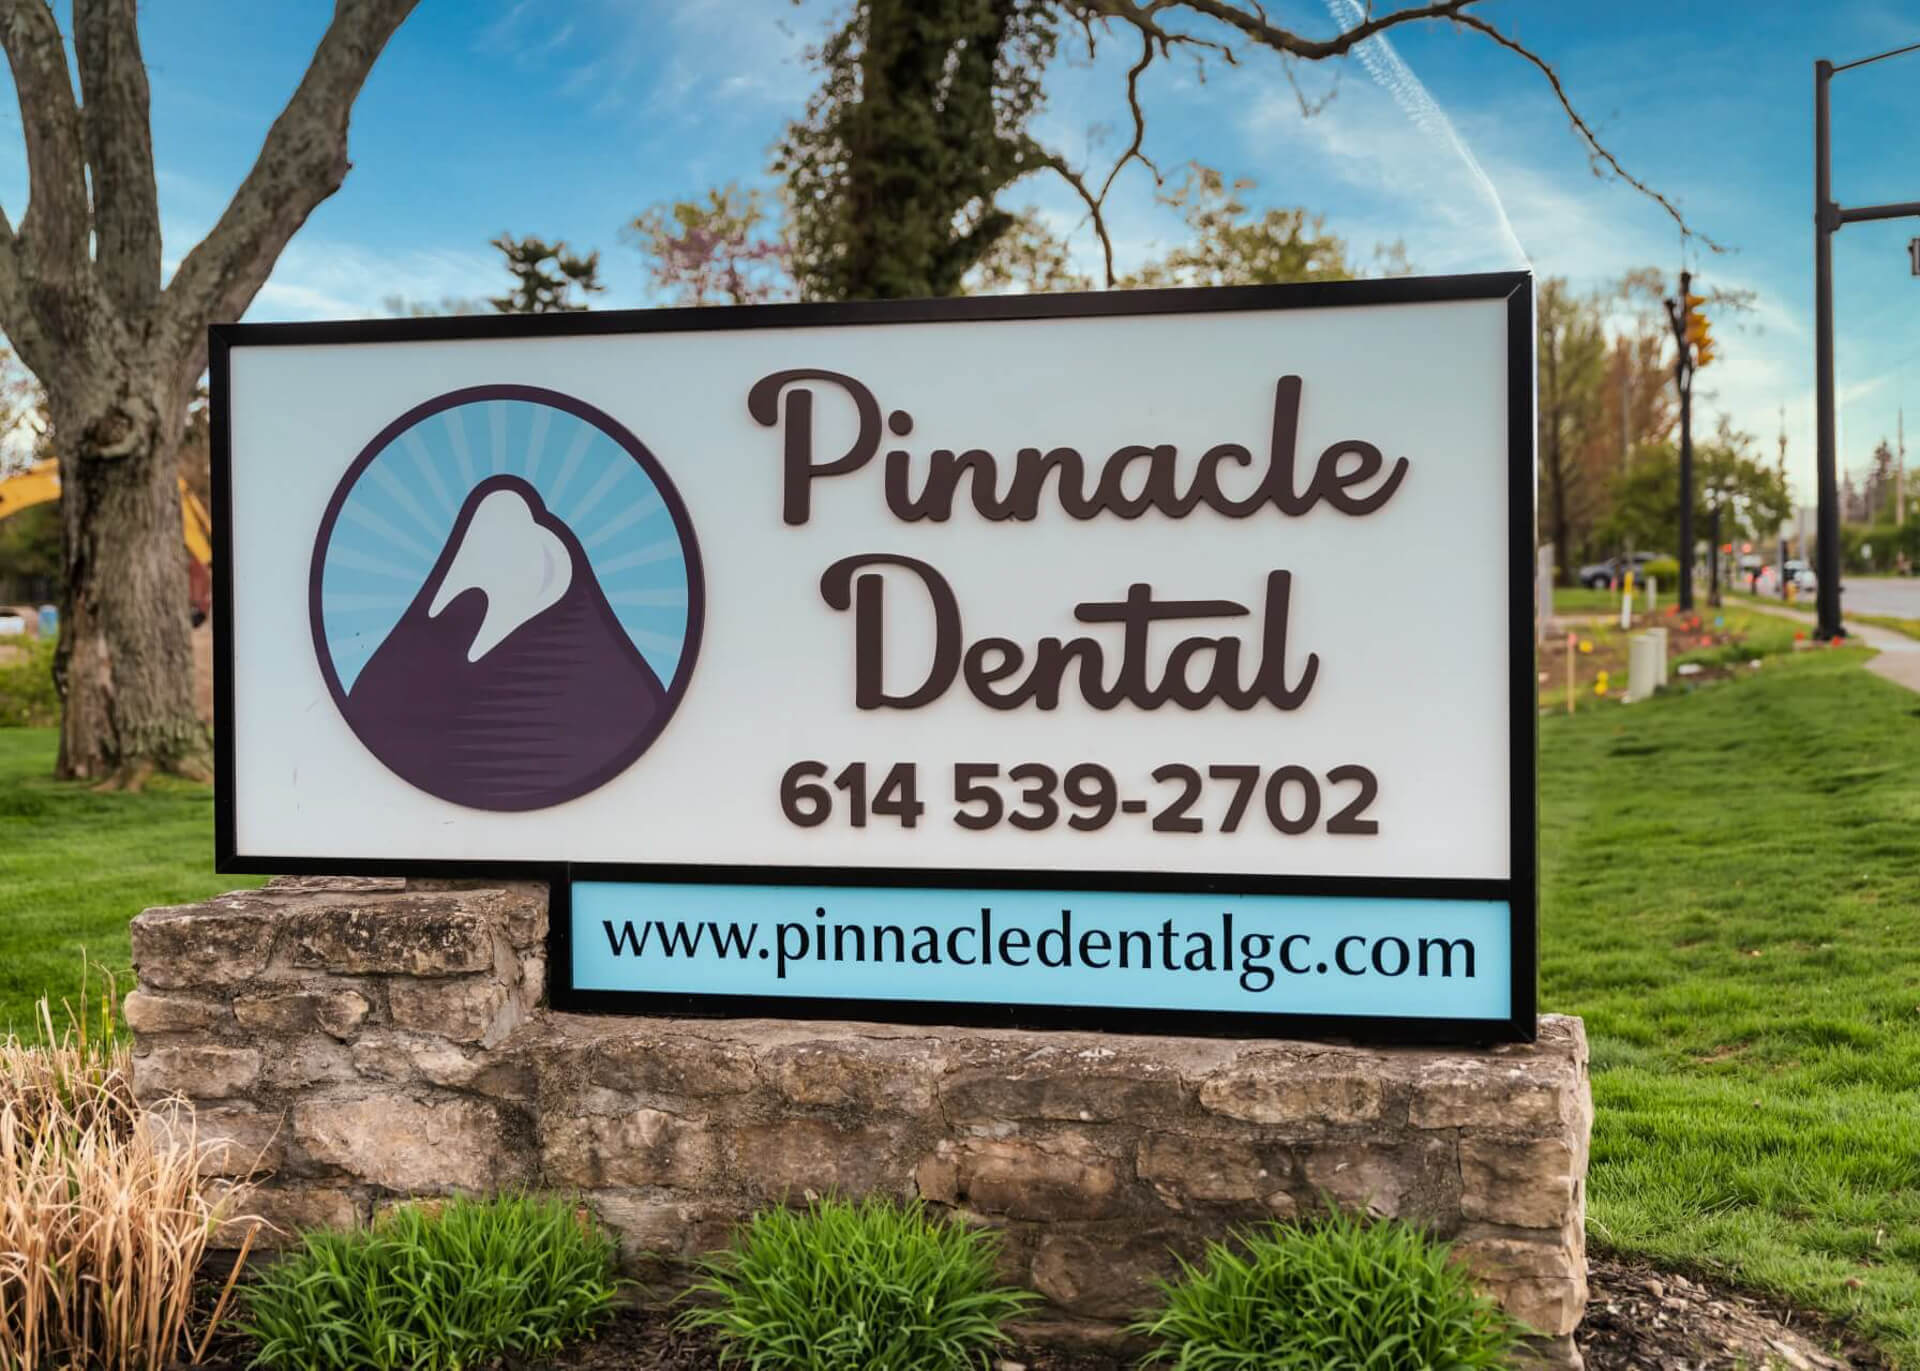 Pinnacle Dental is located in Grove City, Ohio